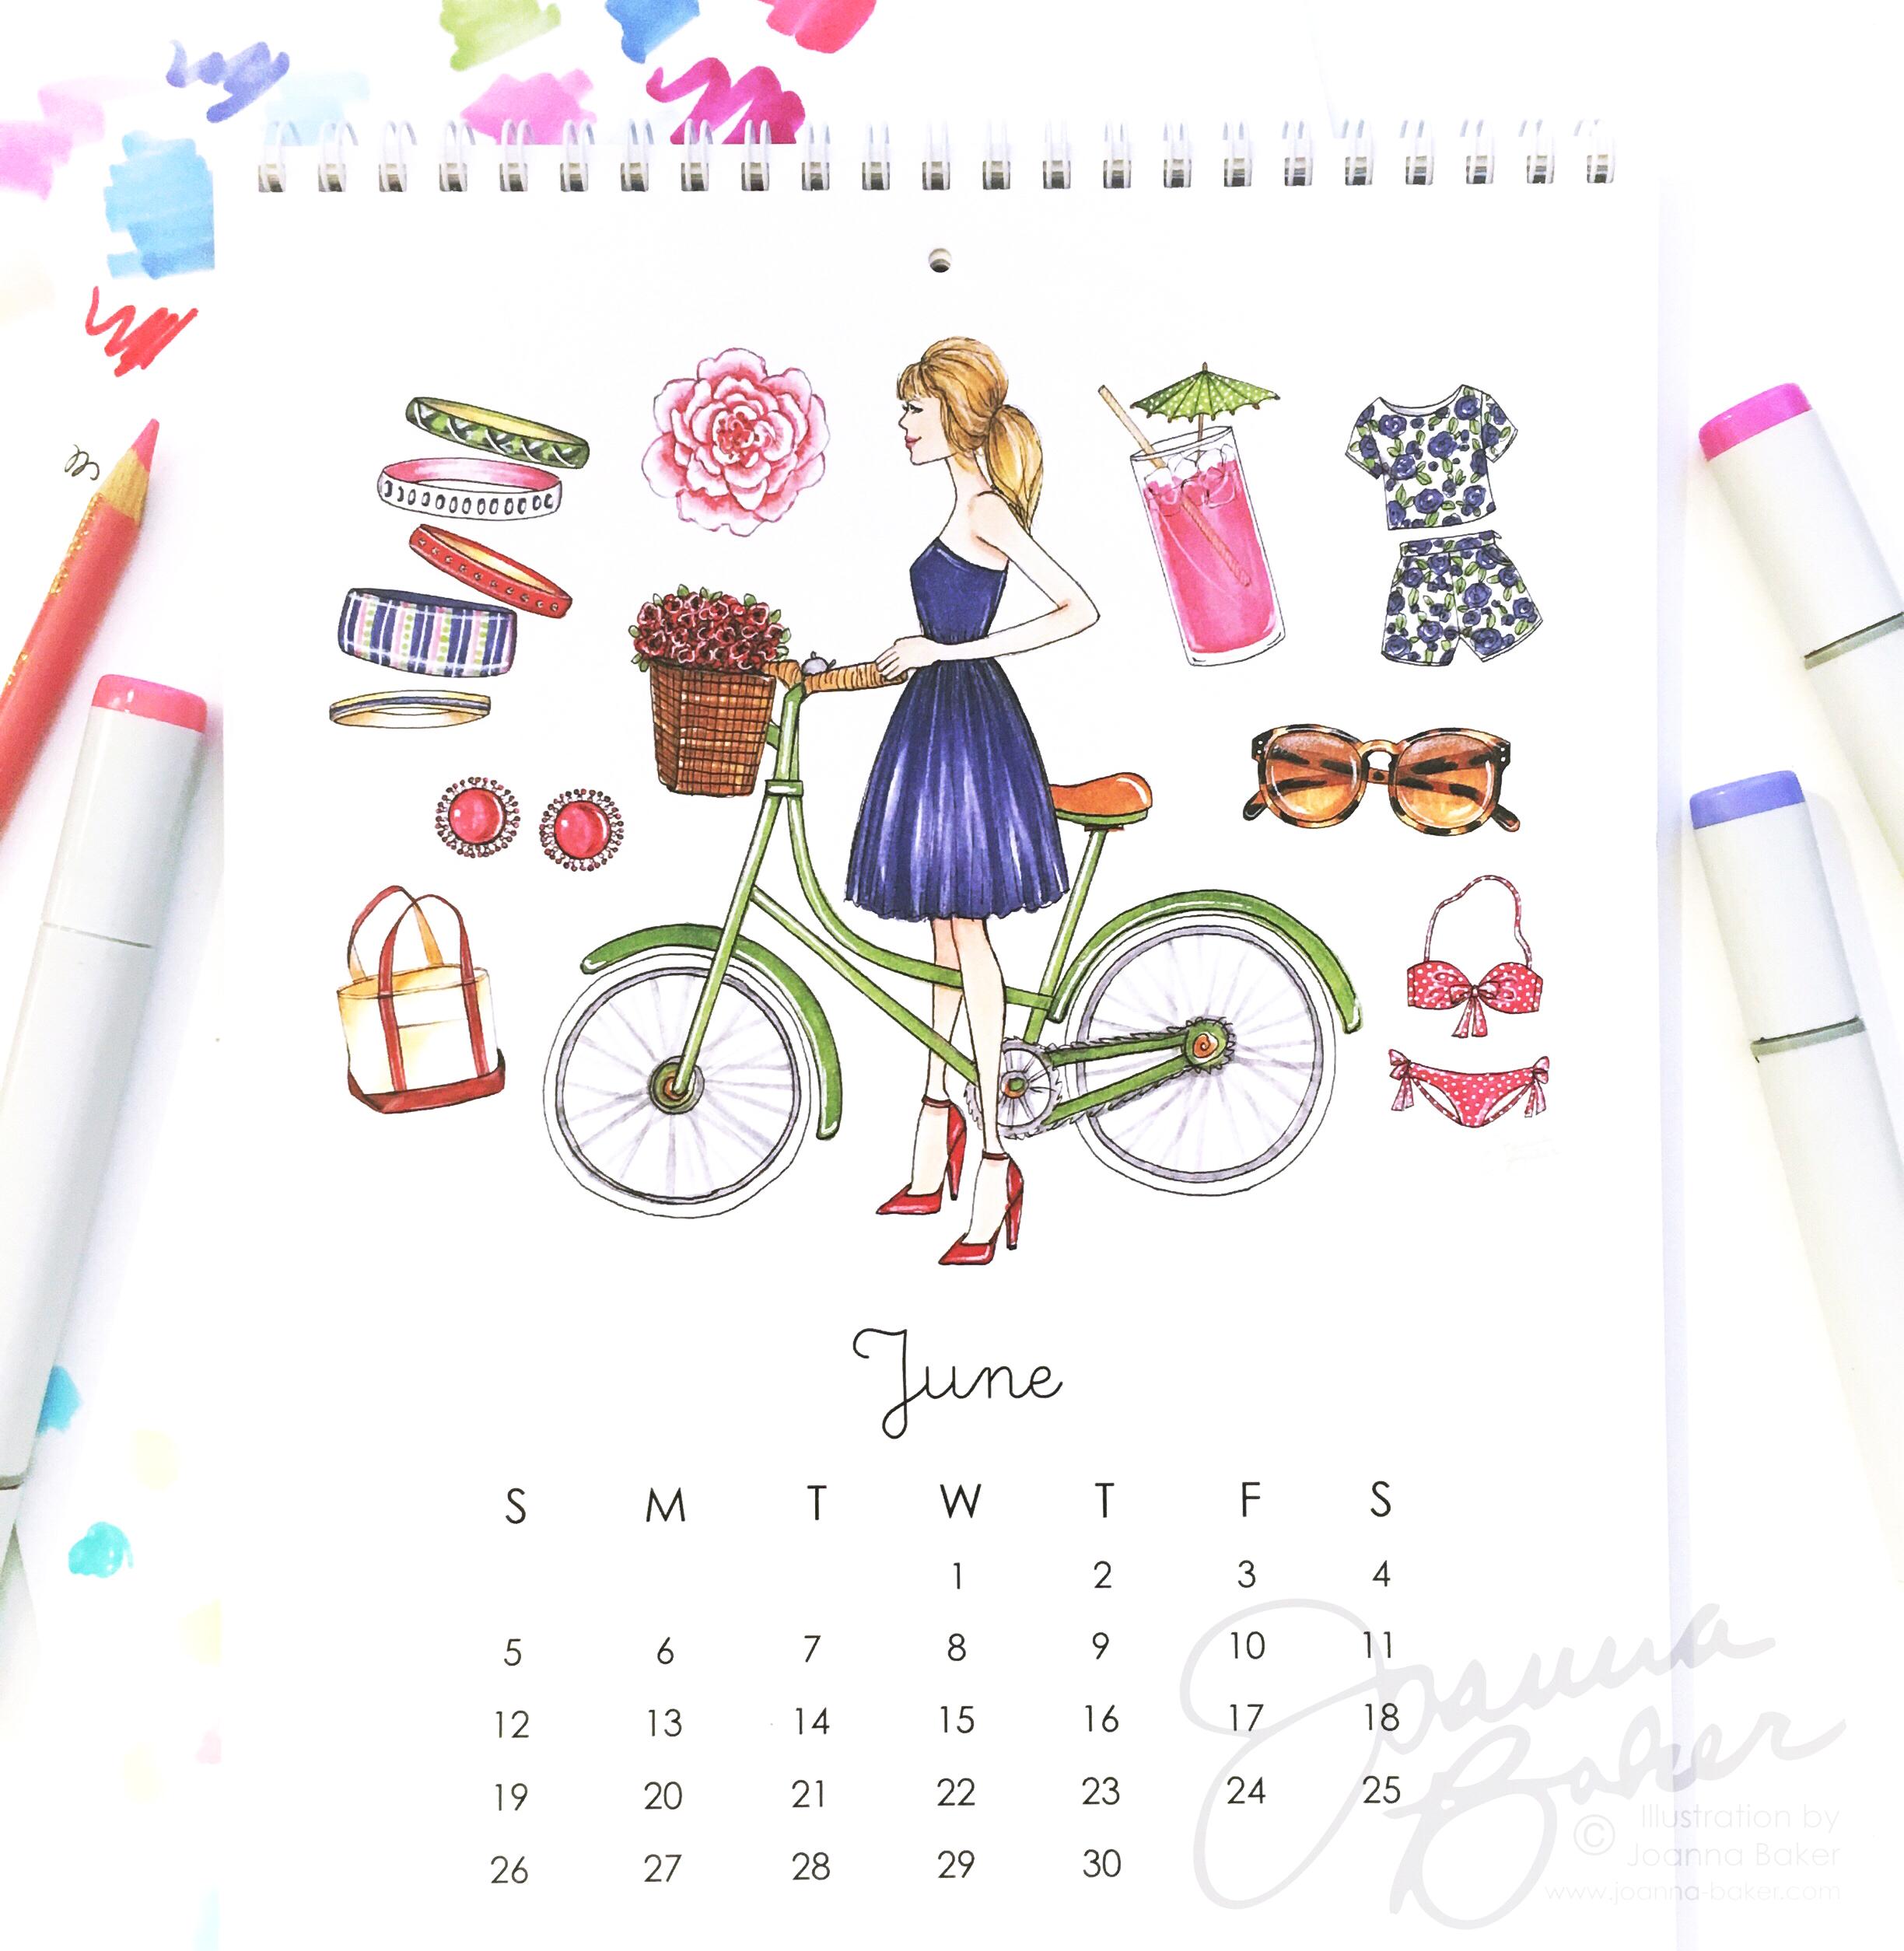 June: Favorite Things 2016 Illustrated Calendar by Joanna Baker